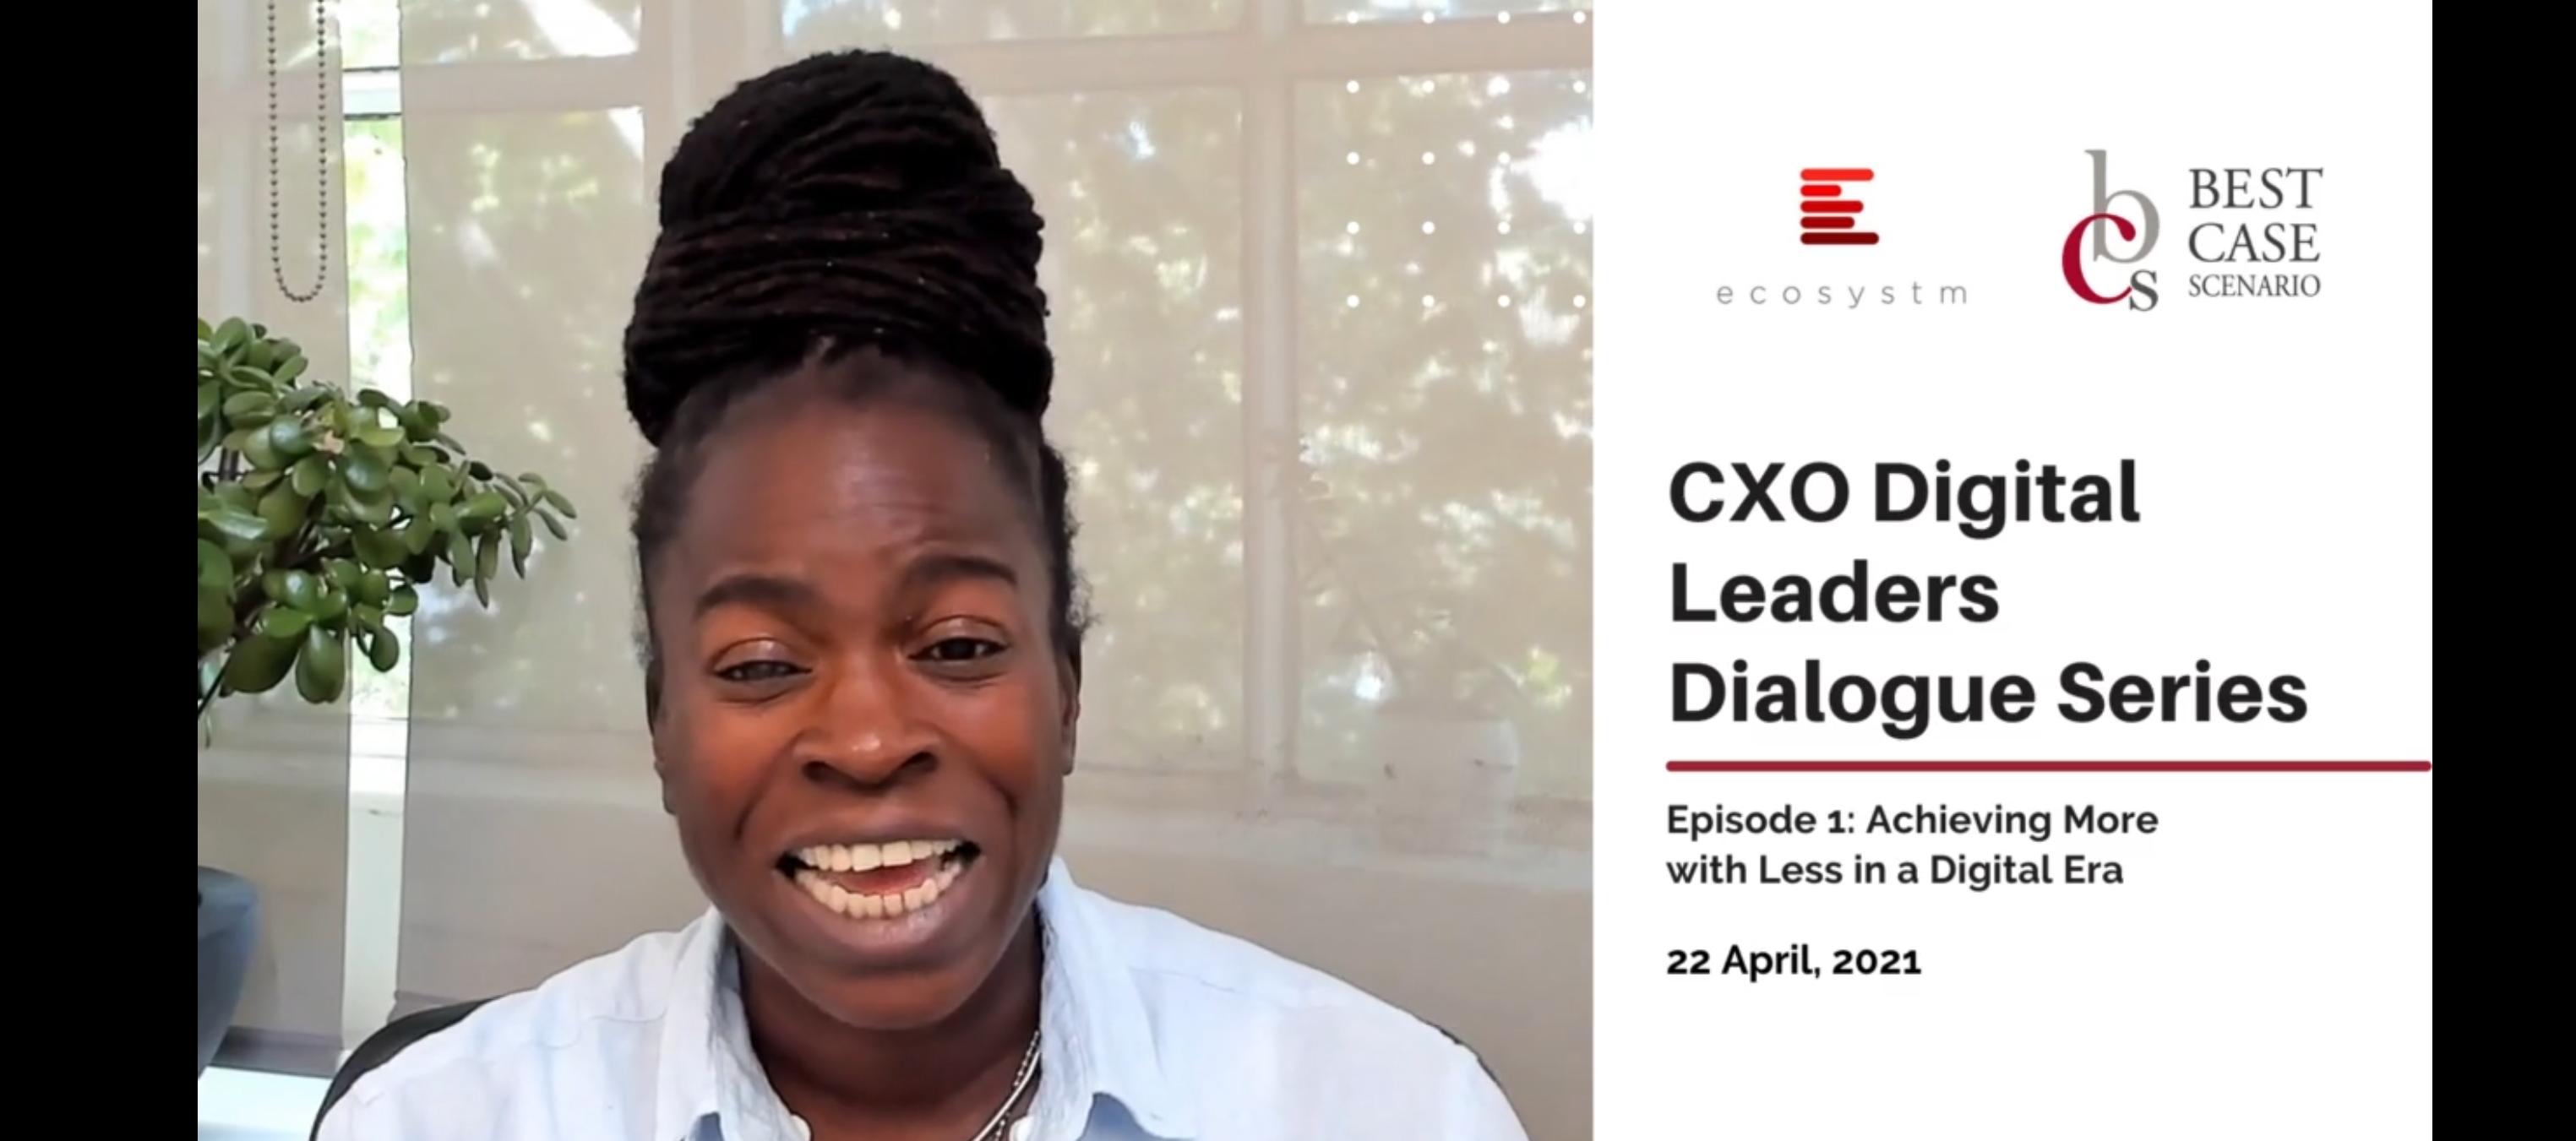 CXO Digital Leaders Dialogue Launch